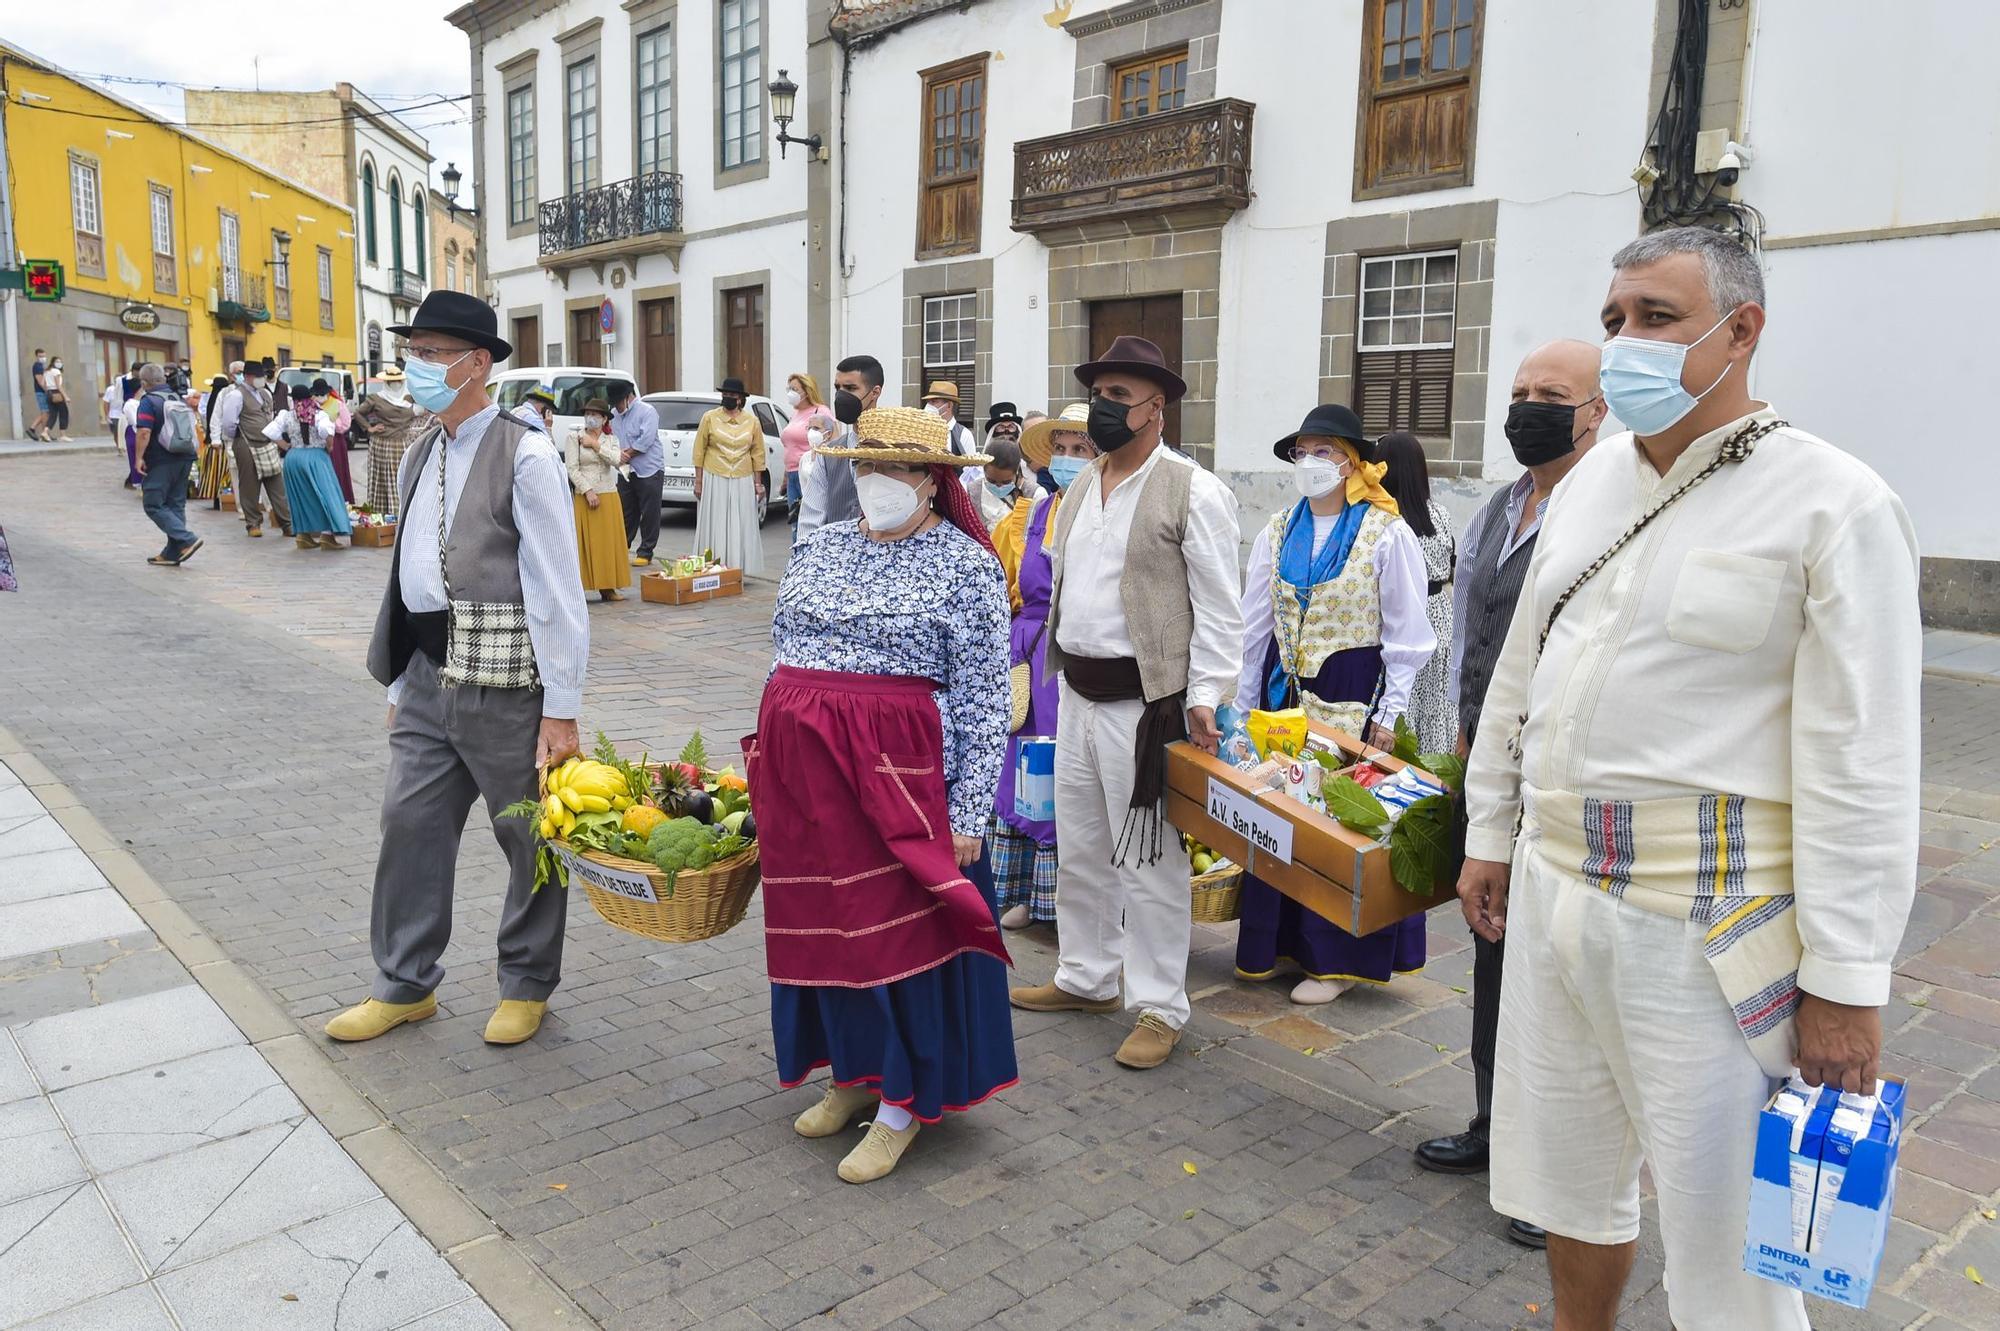 Ofrenda a San Juan en Telde (24/06/2021)